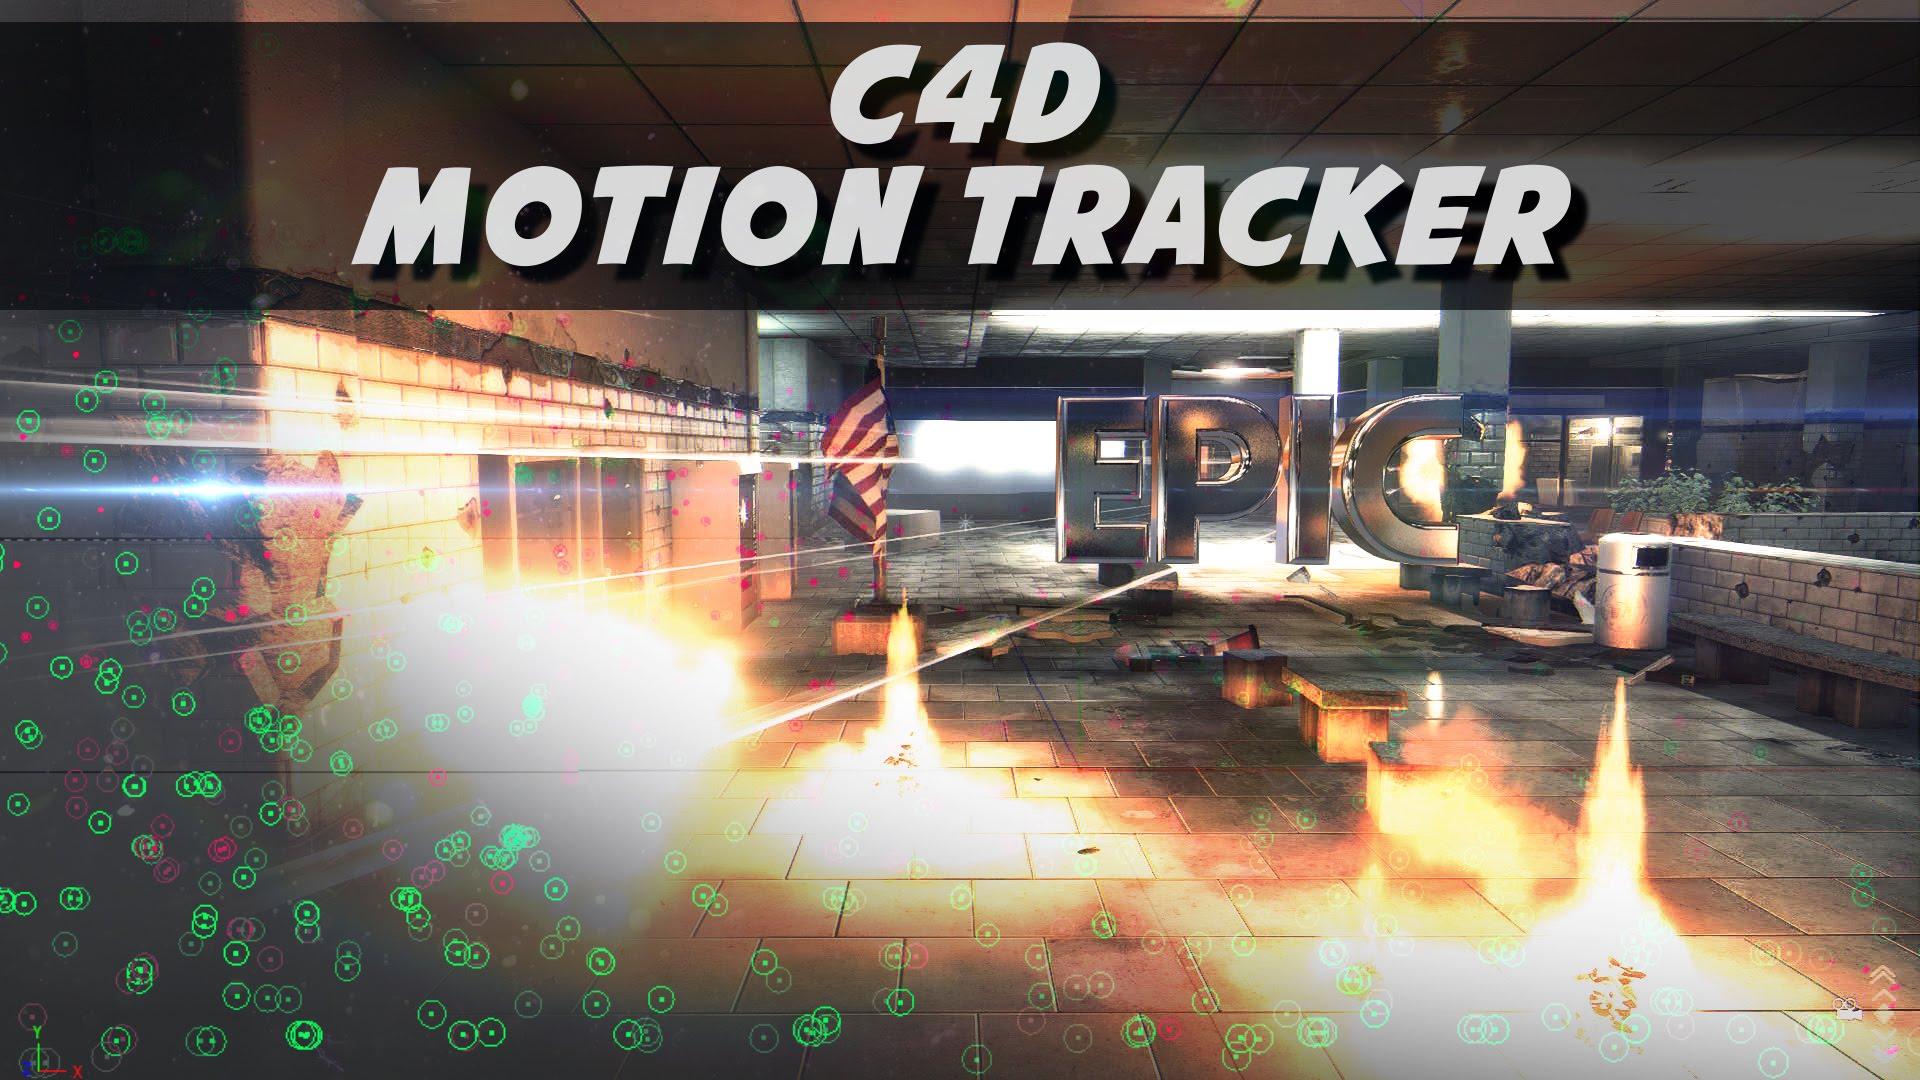 C4d r16 motion tracker vs ae track camera baditri Choice Image